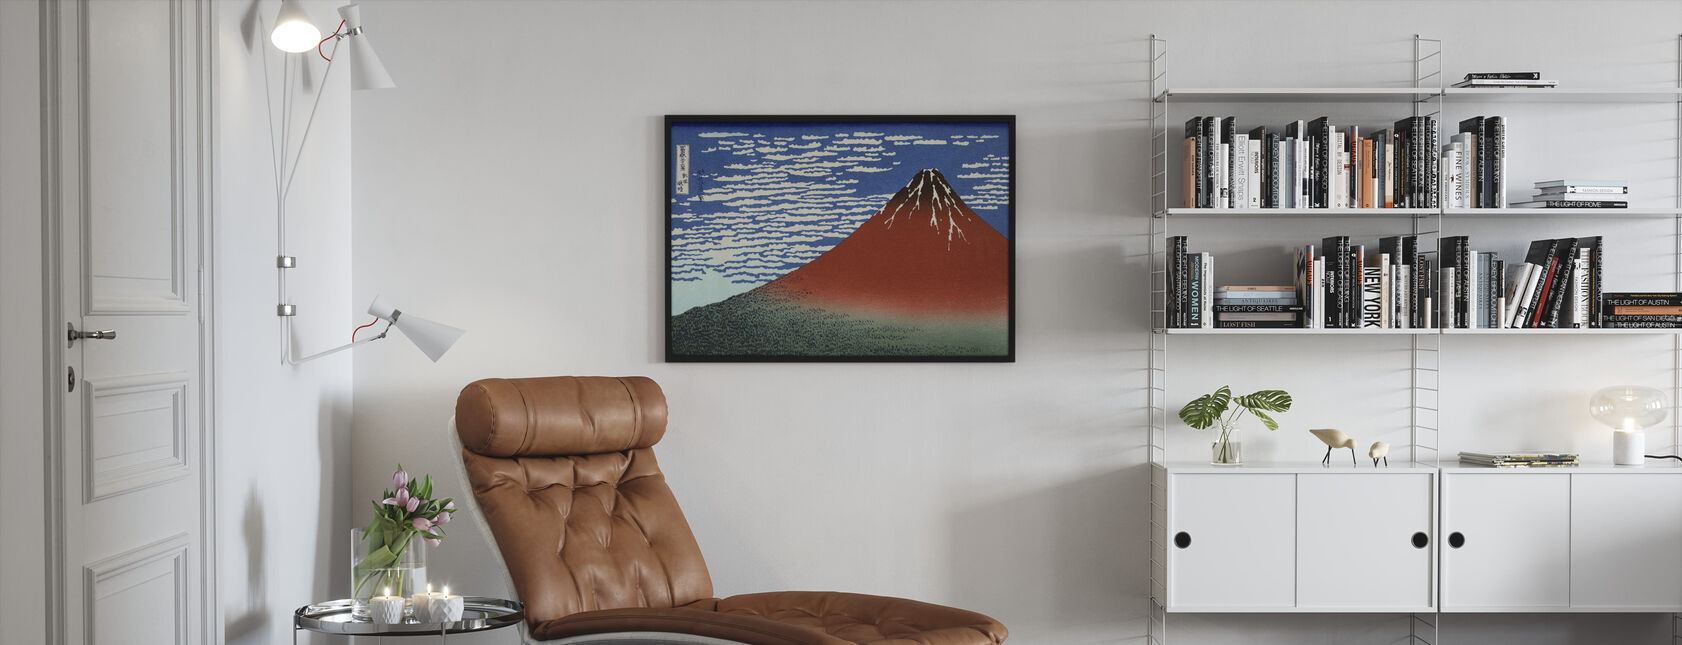 Red Fuji, Katsushika Hokusai - Kehystetty kuva - Olohuone